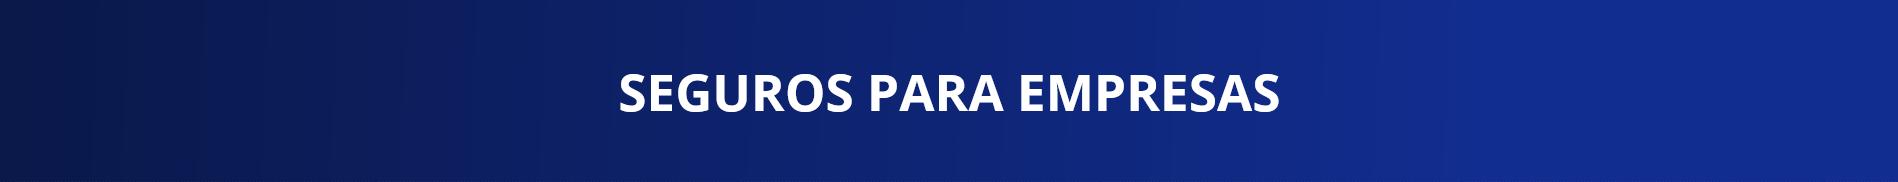 empresas_banner